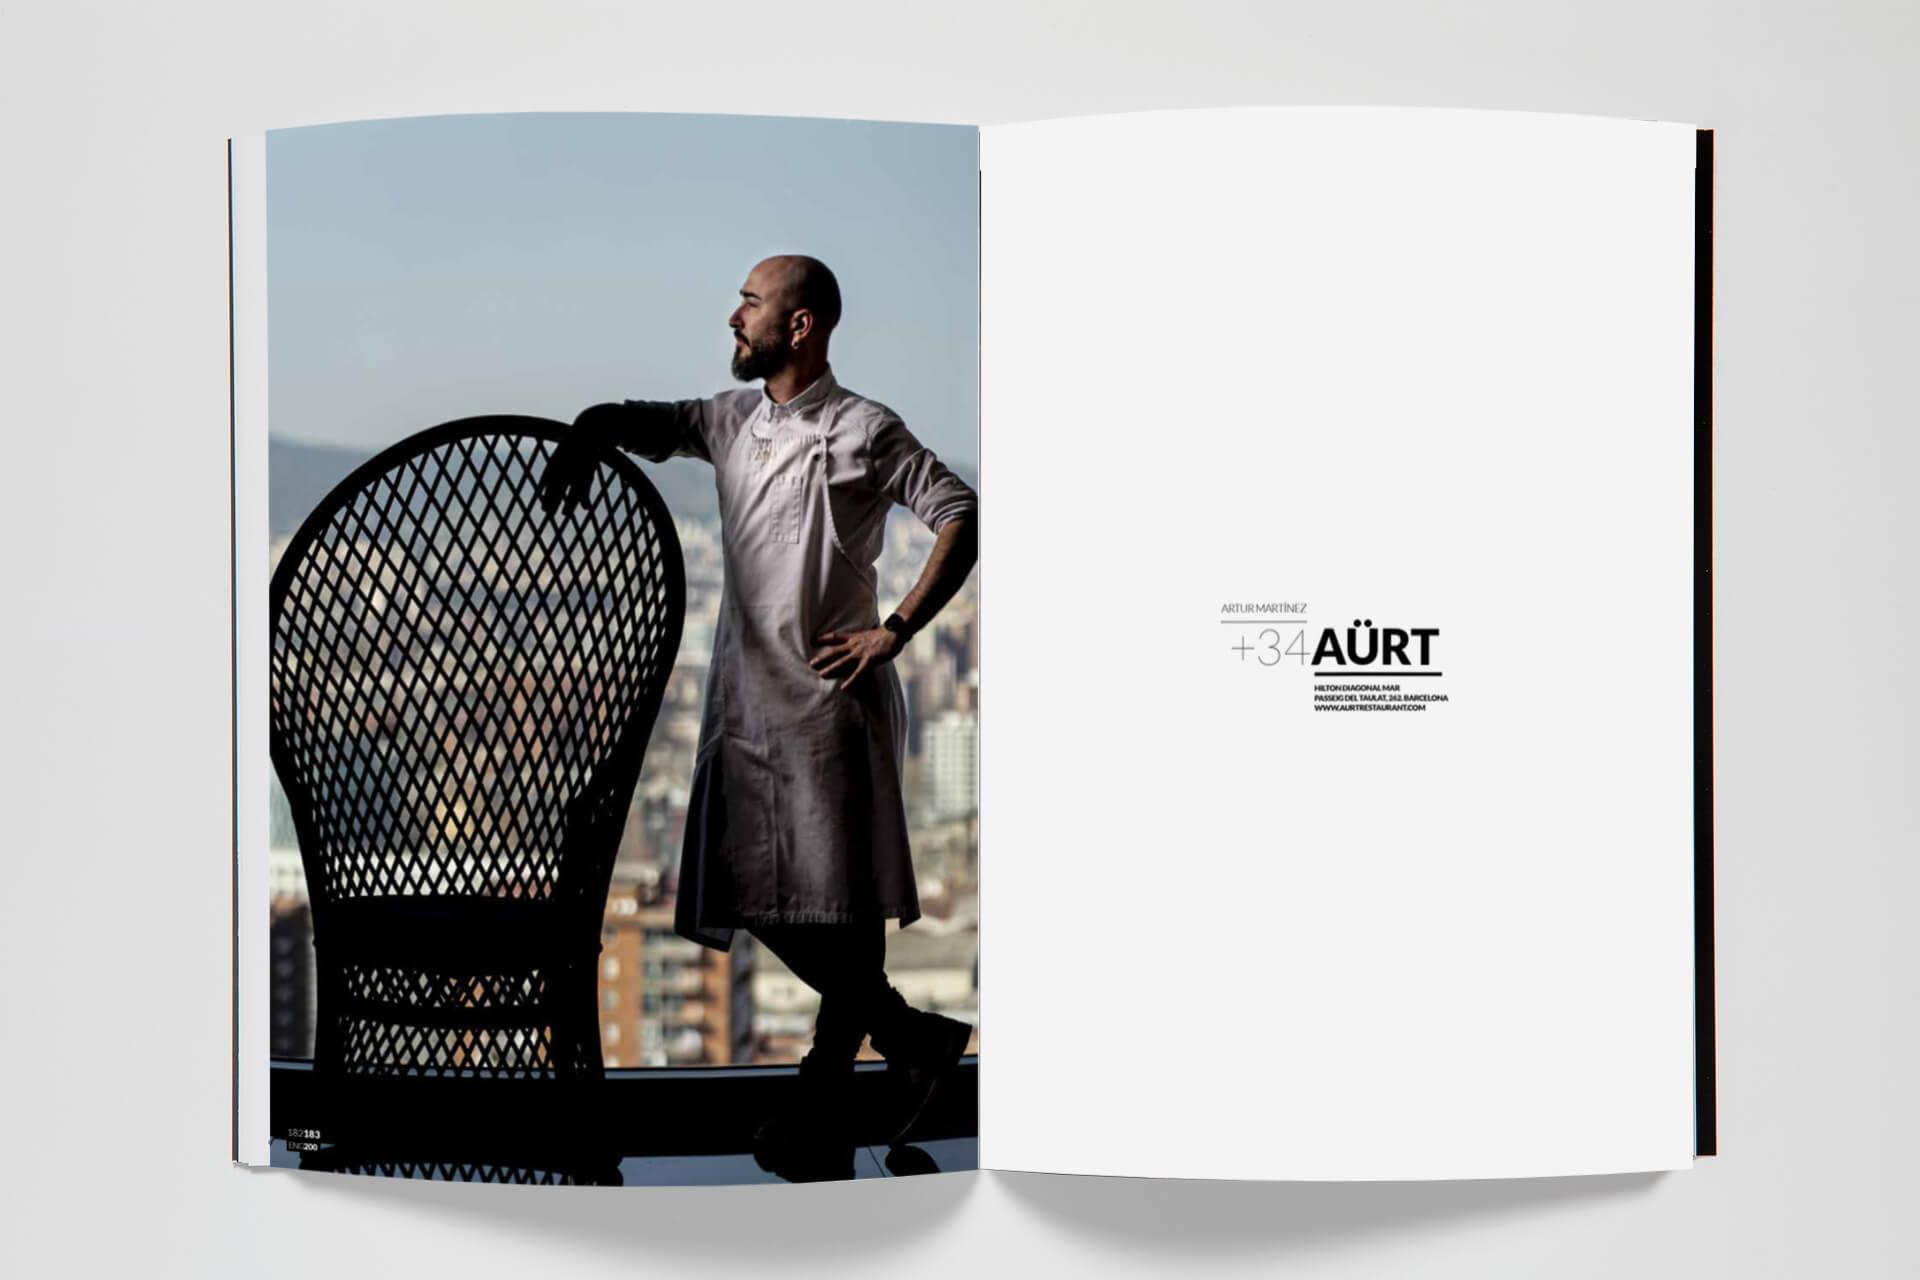 aurt_1-3